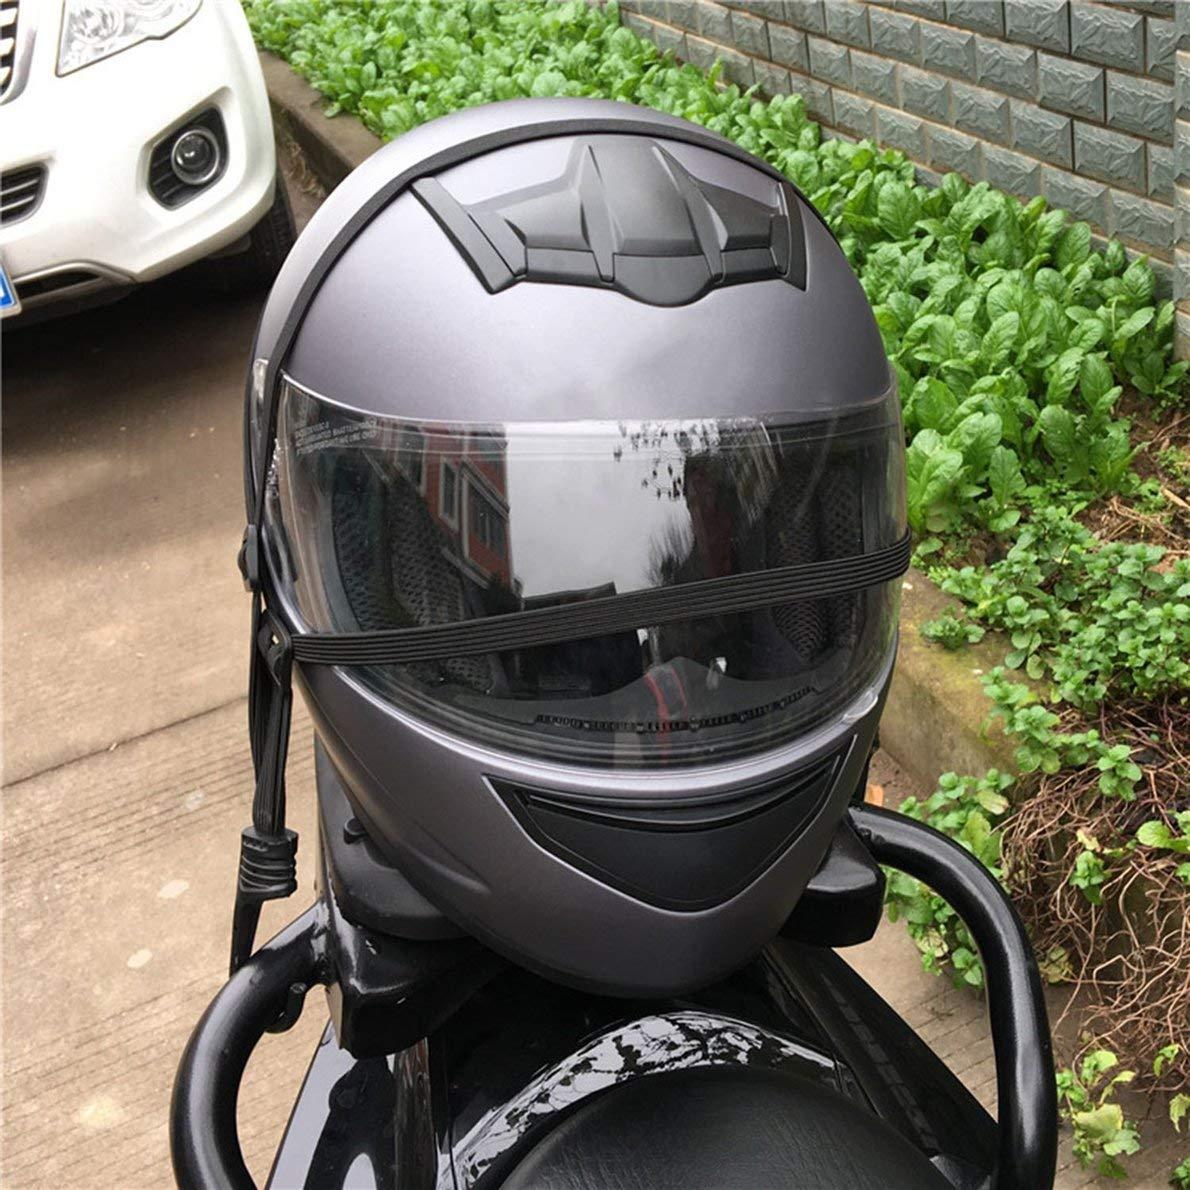 Uqiangbao Motorcycle Helmet Strength Retractable Elastic Rope with Two Hooks Universal Luggage Flexible Strap Ties Belting